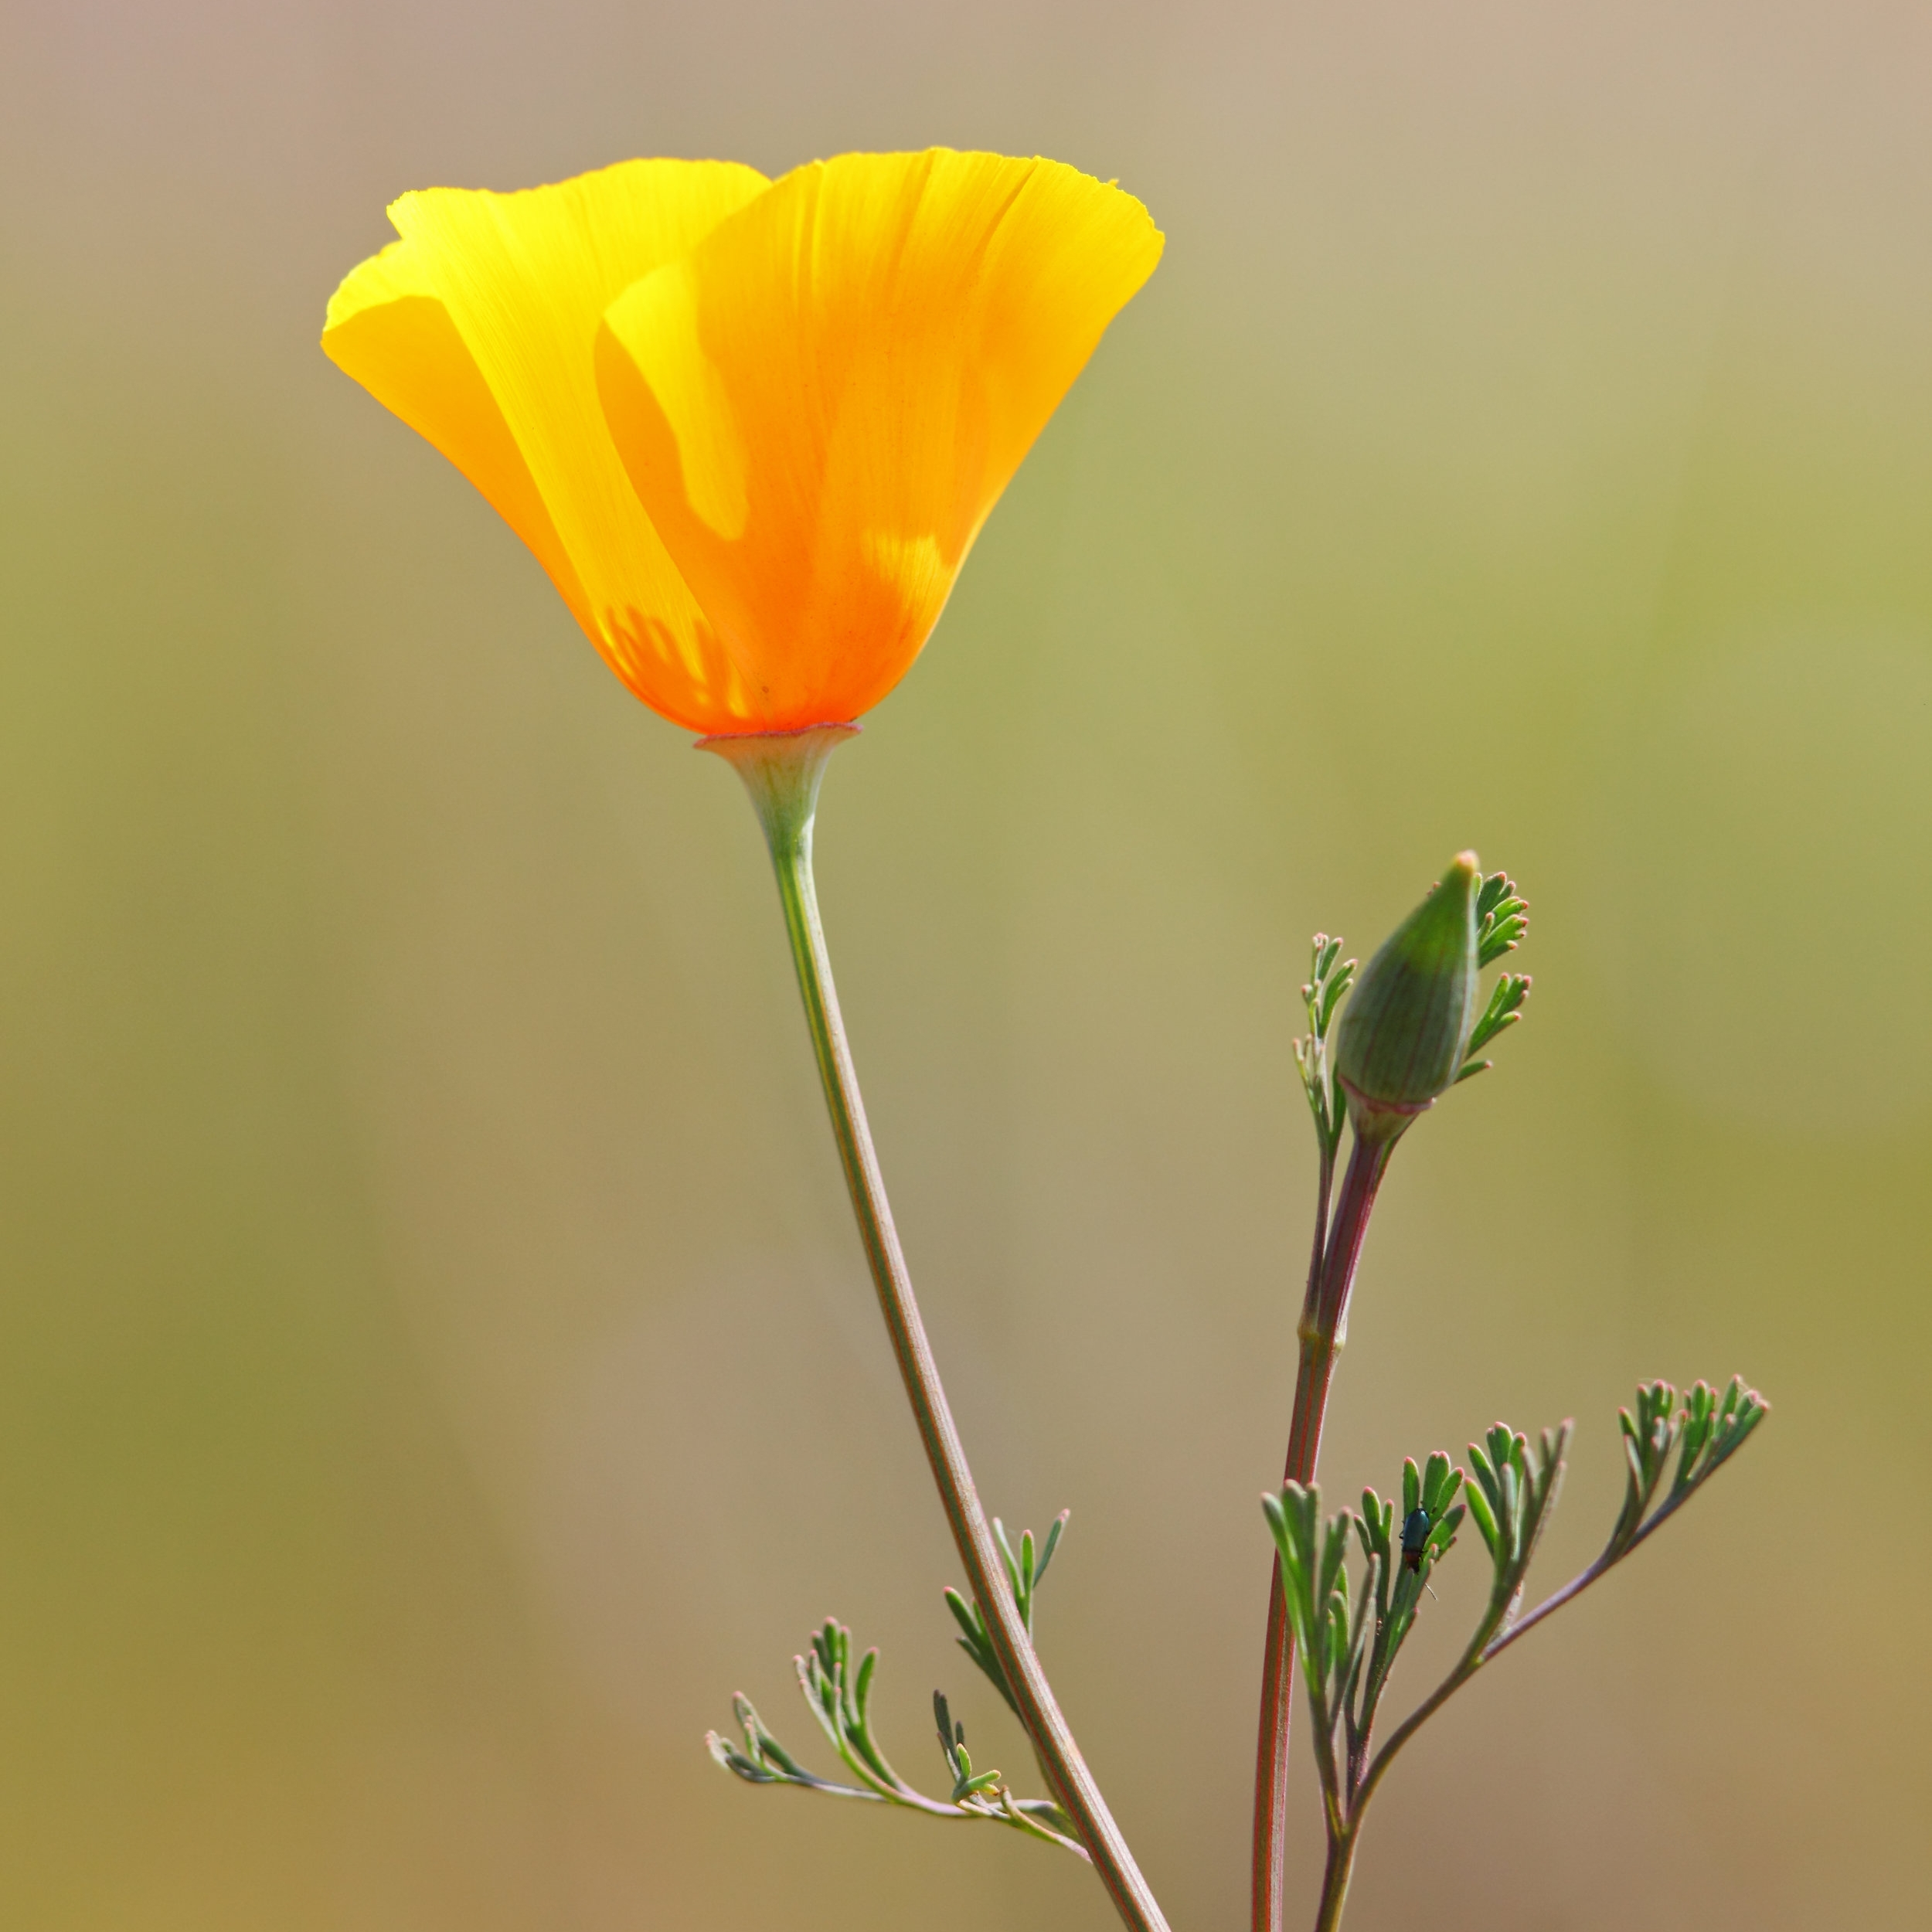 California_poppy_(Eschscholzia_californica).jpg